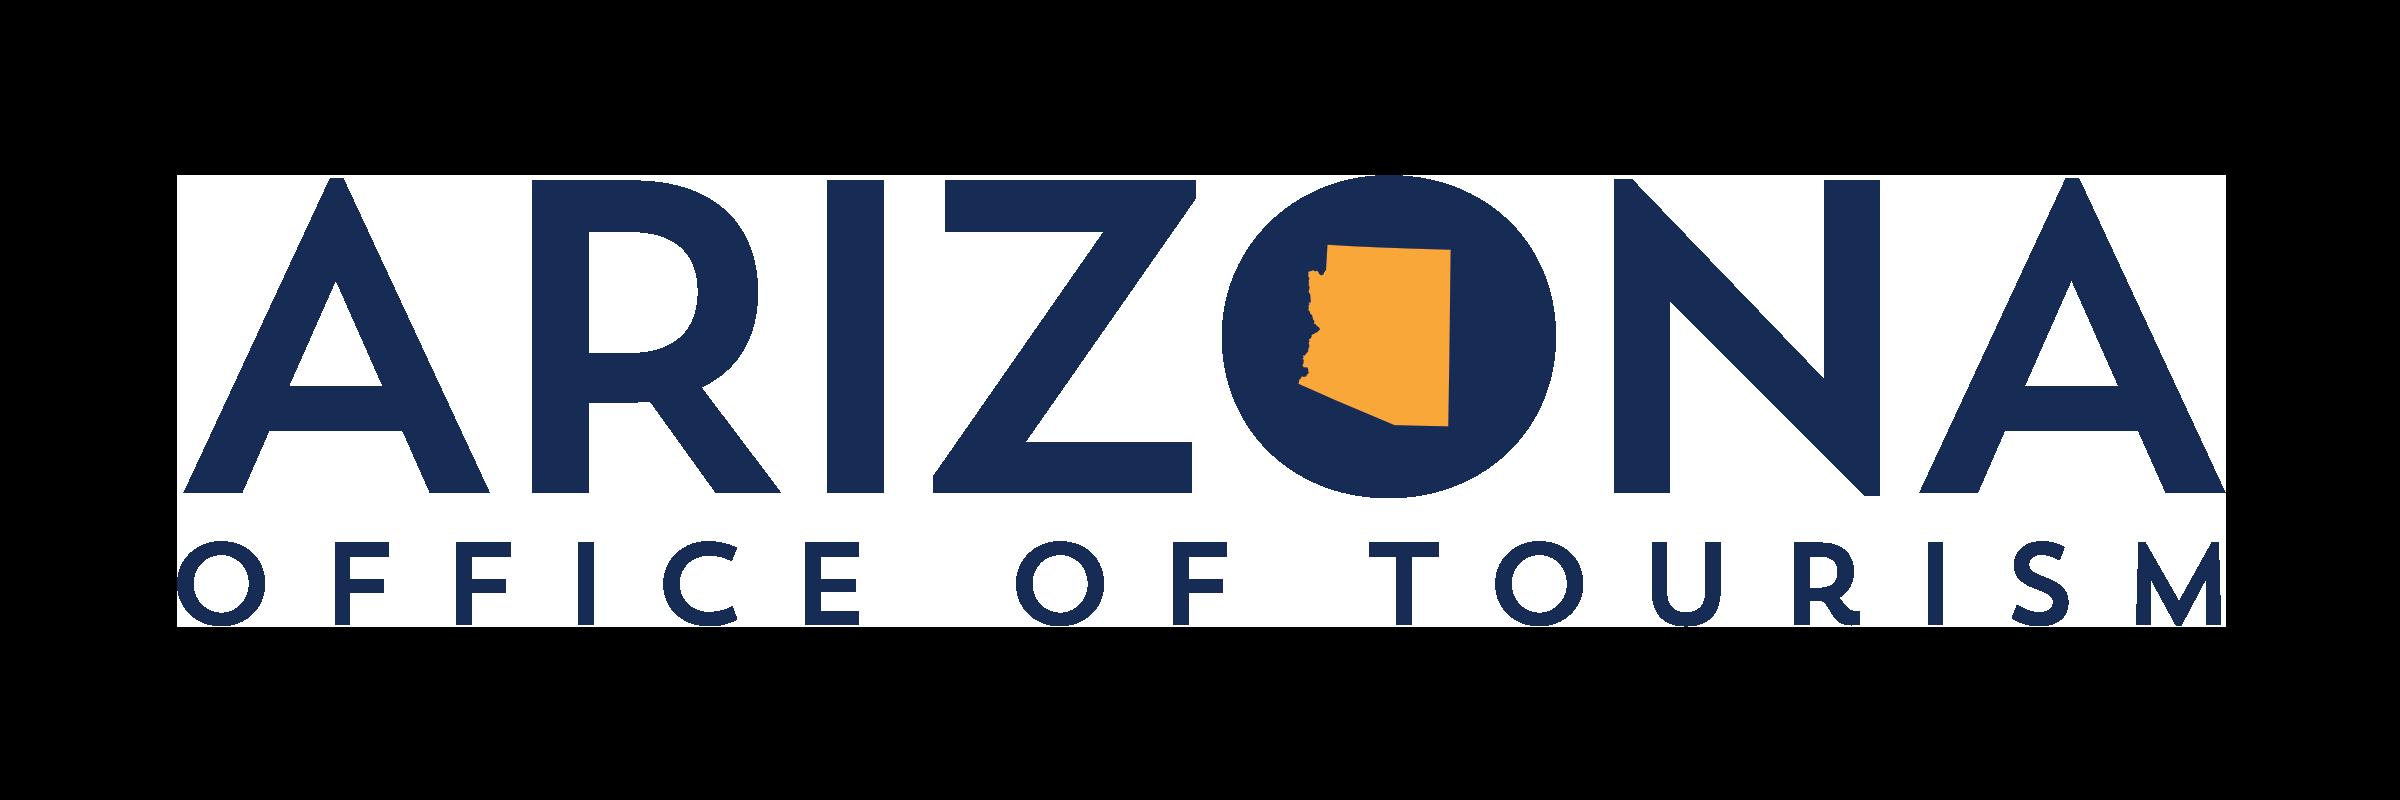 Arizona_AOT_blue-yellow.png